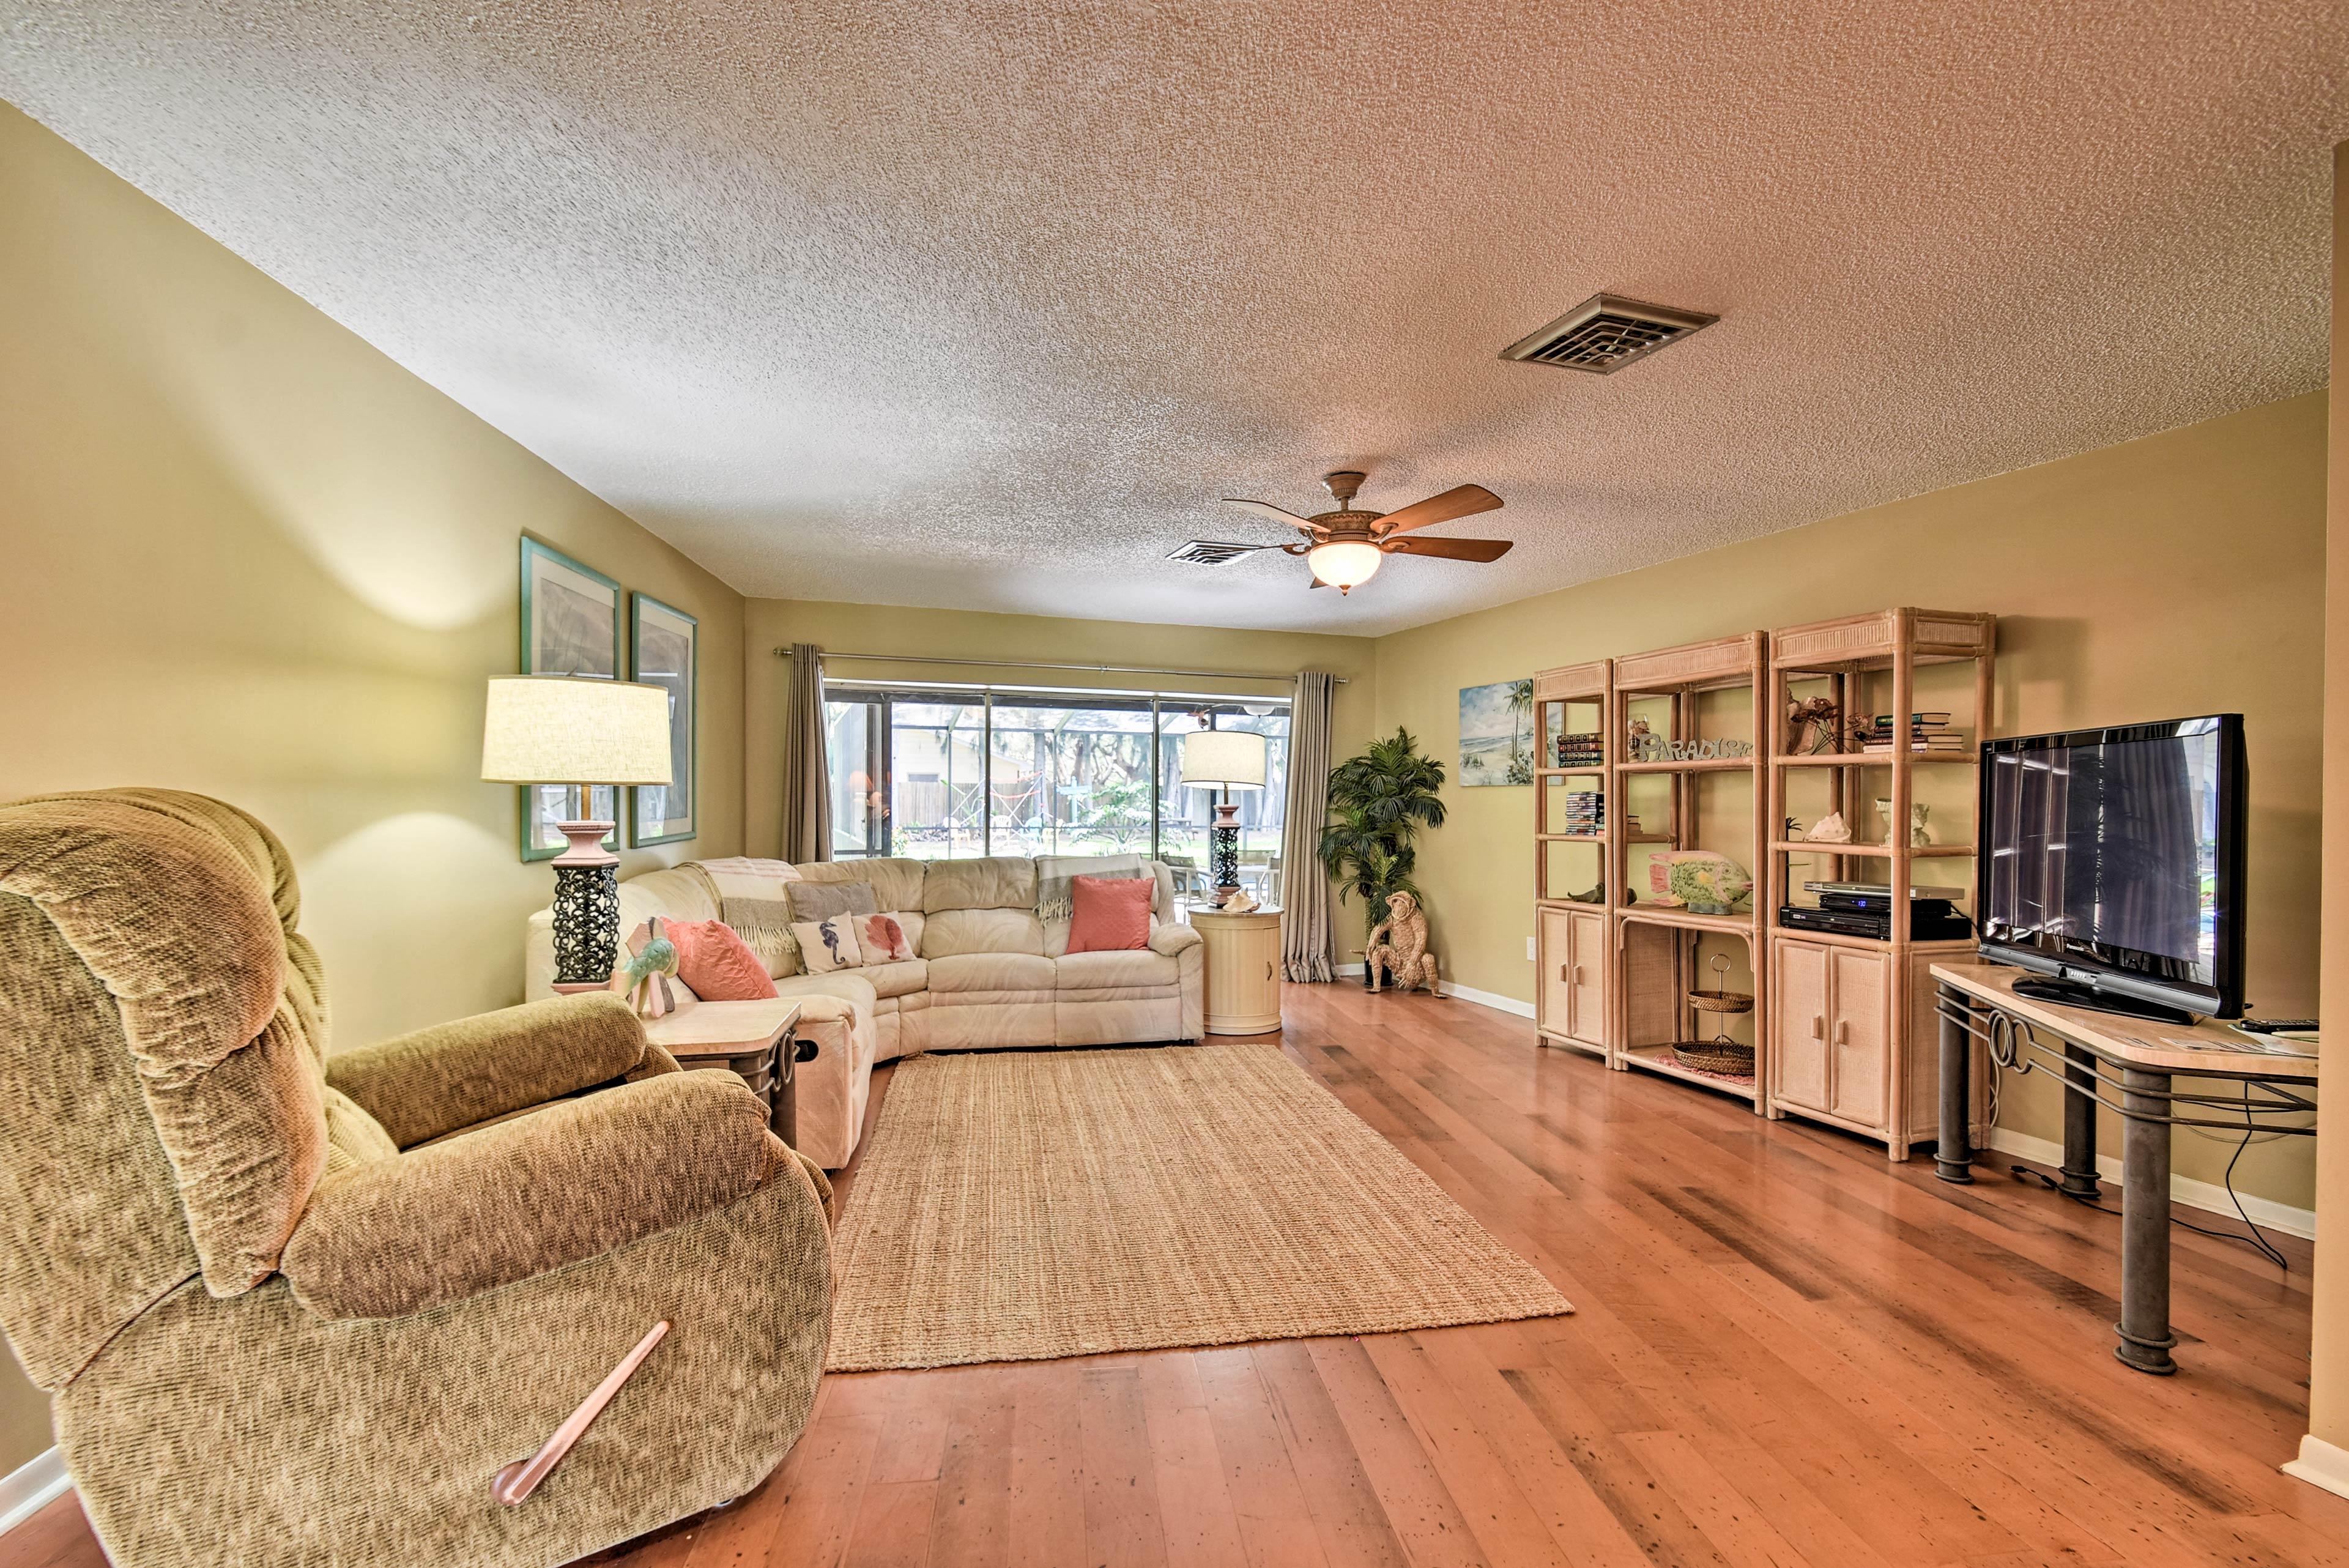 Hardwood floors elevate this home.